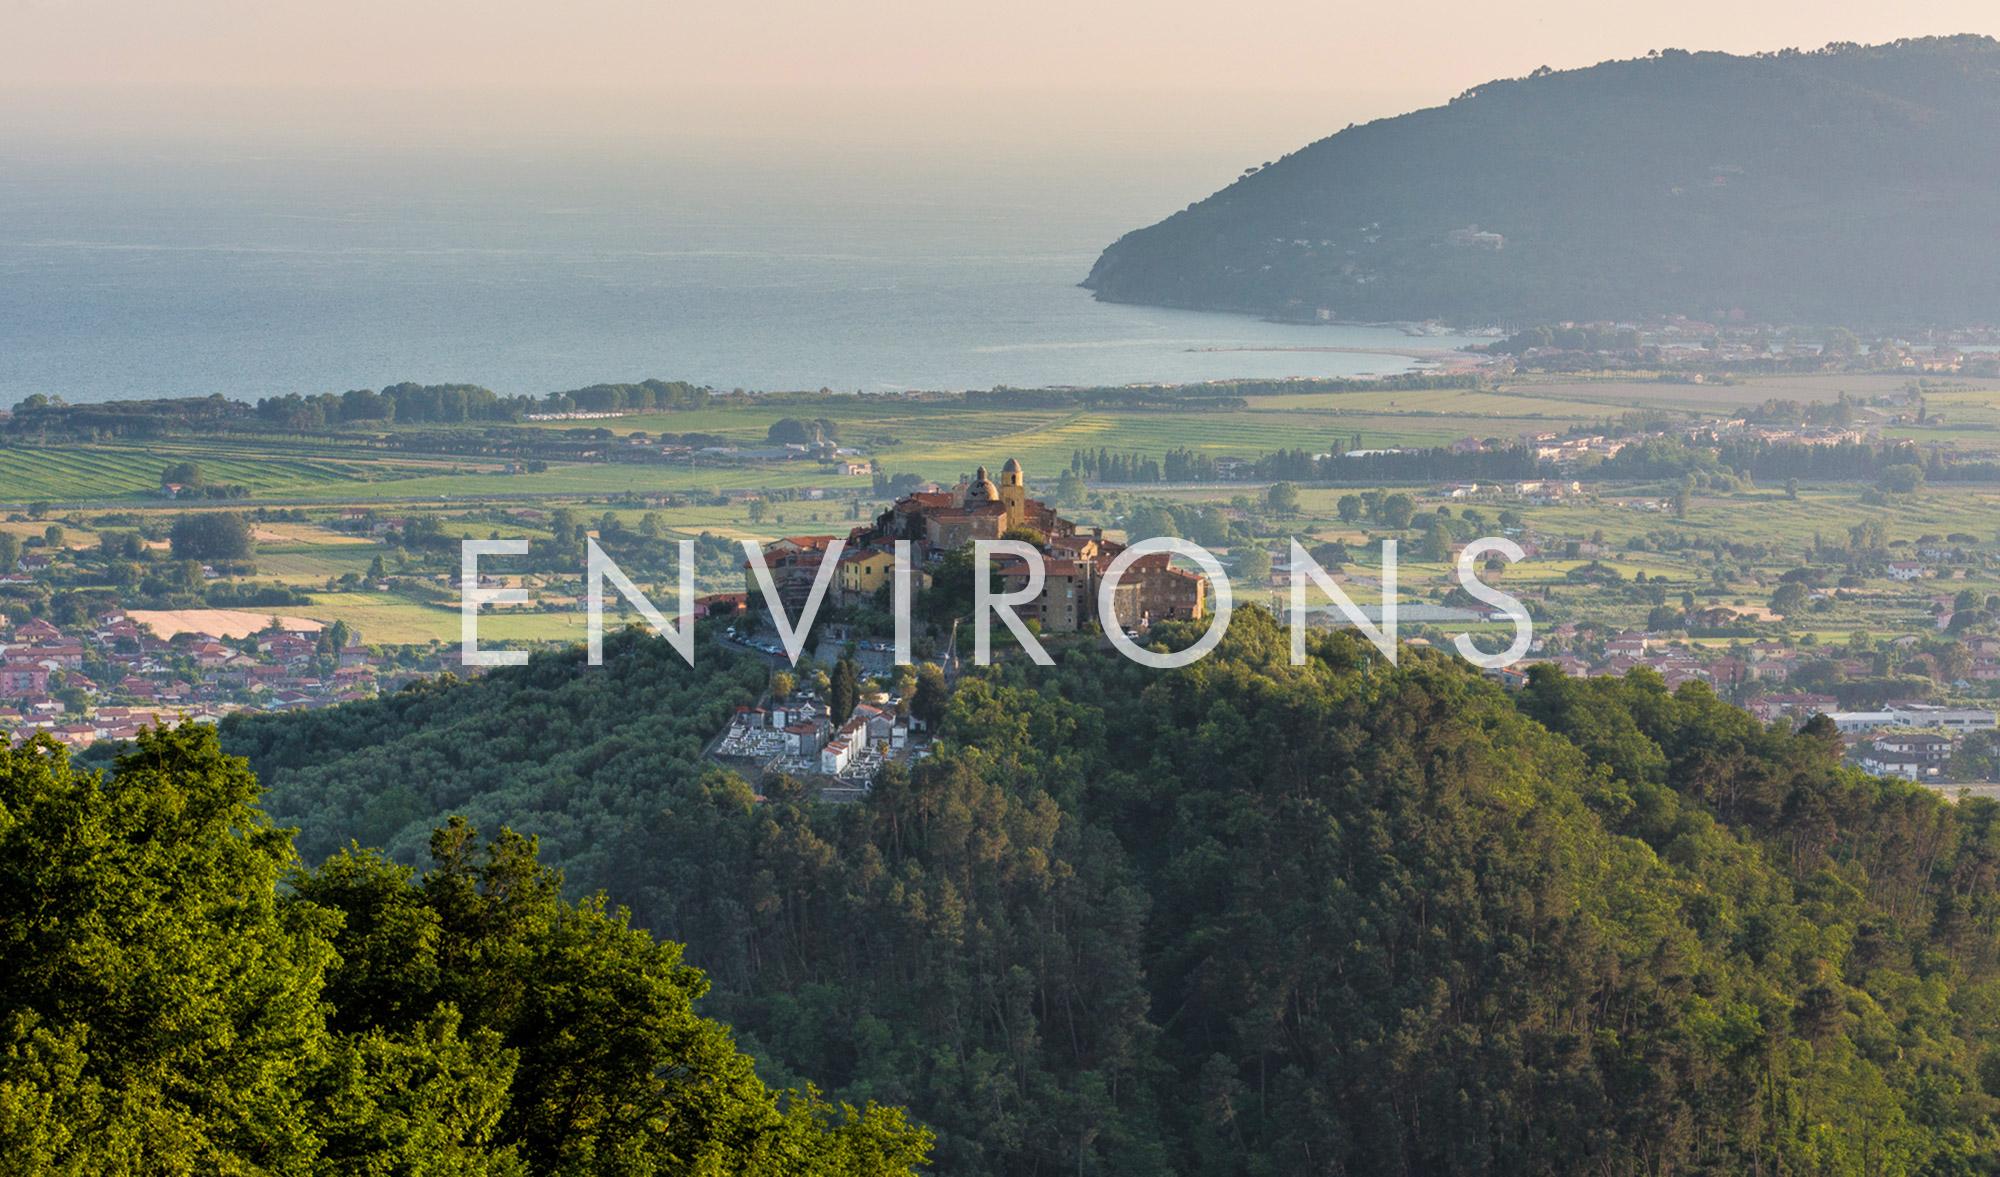 Tuscany-Study-Liguria-Mediterranean-Panorama-3.jpg